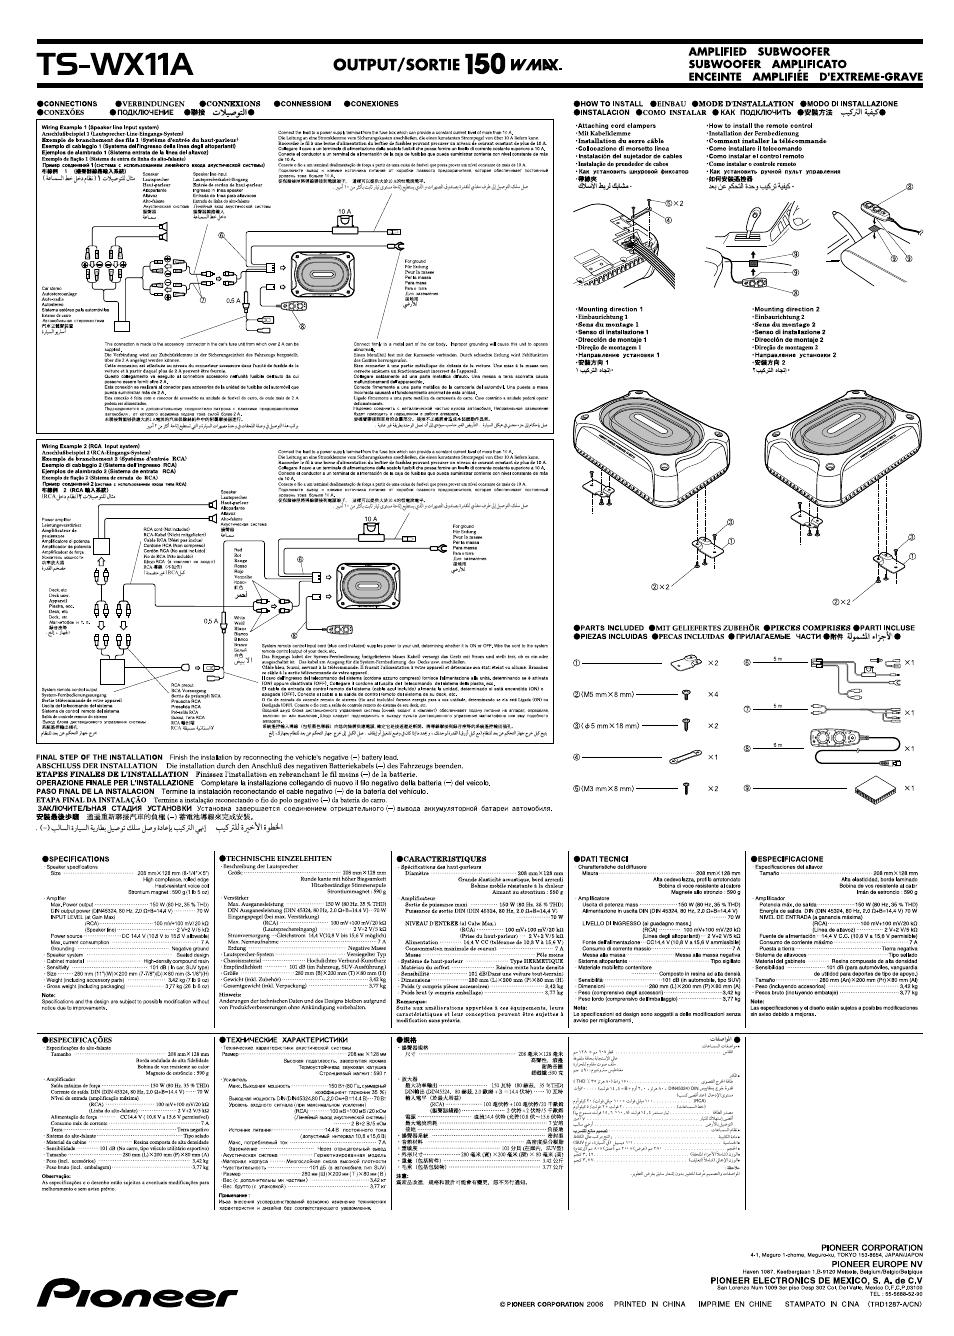 Output/sortie 150 и^/икс, Pioneer corporation, Pioneer